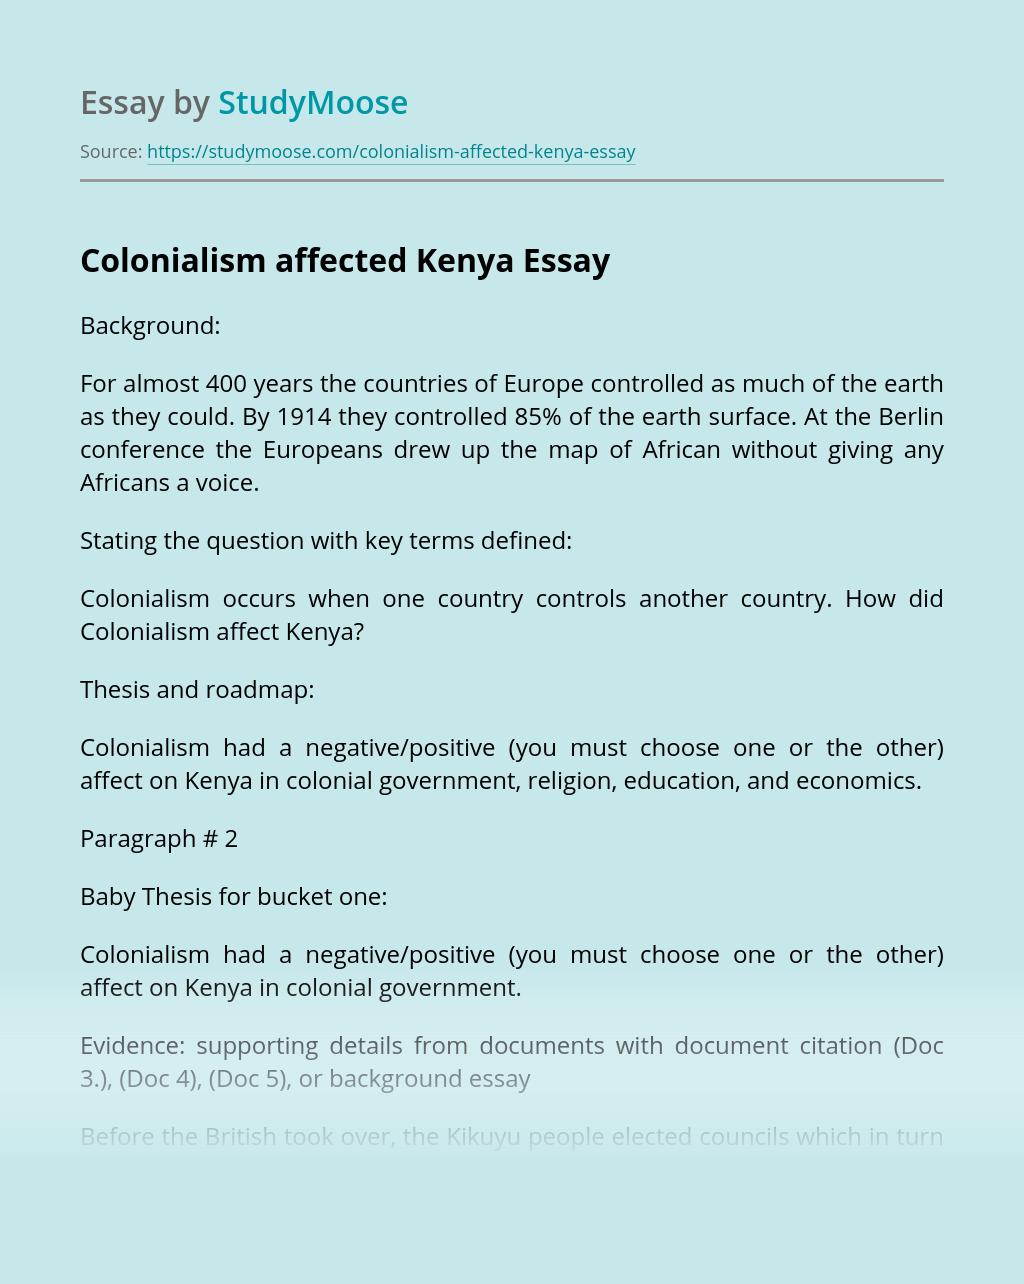 Colonialism affected Kenya